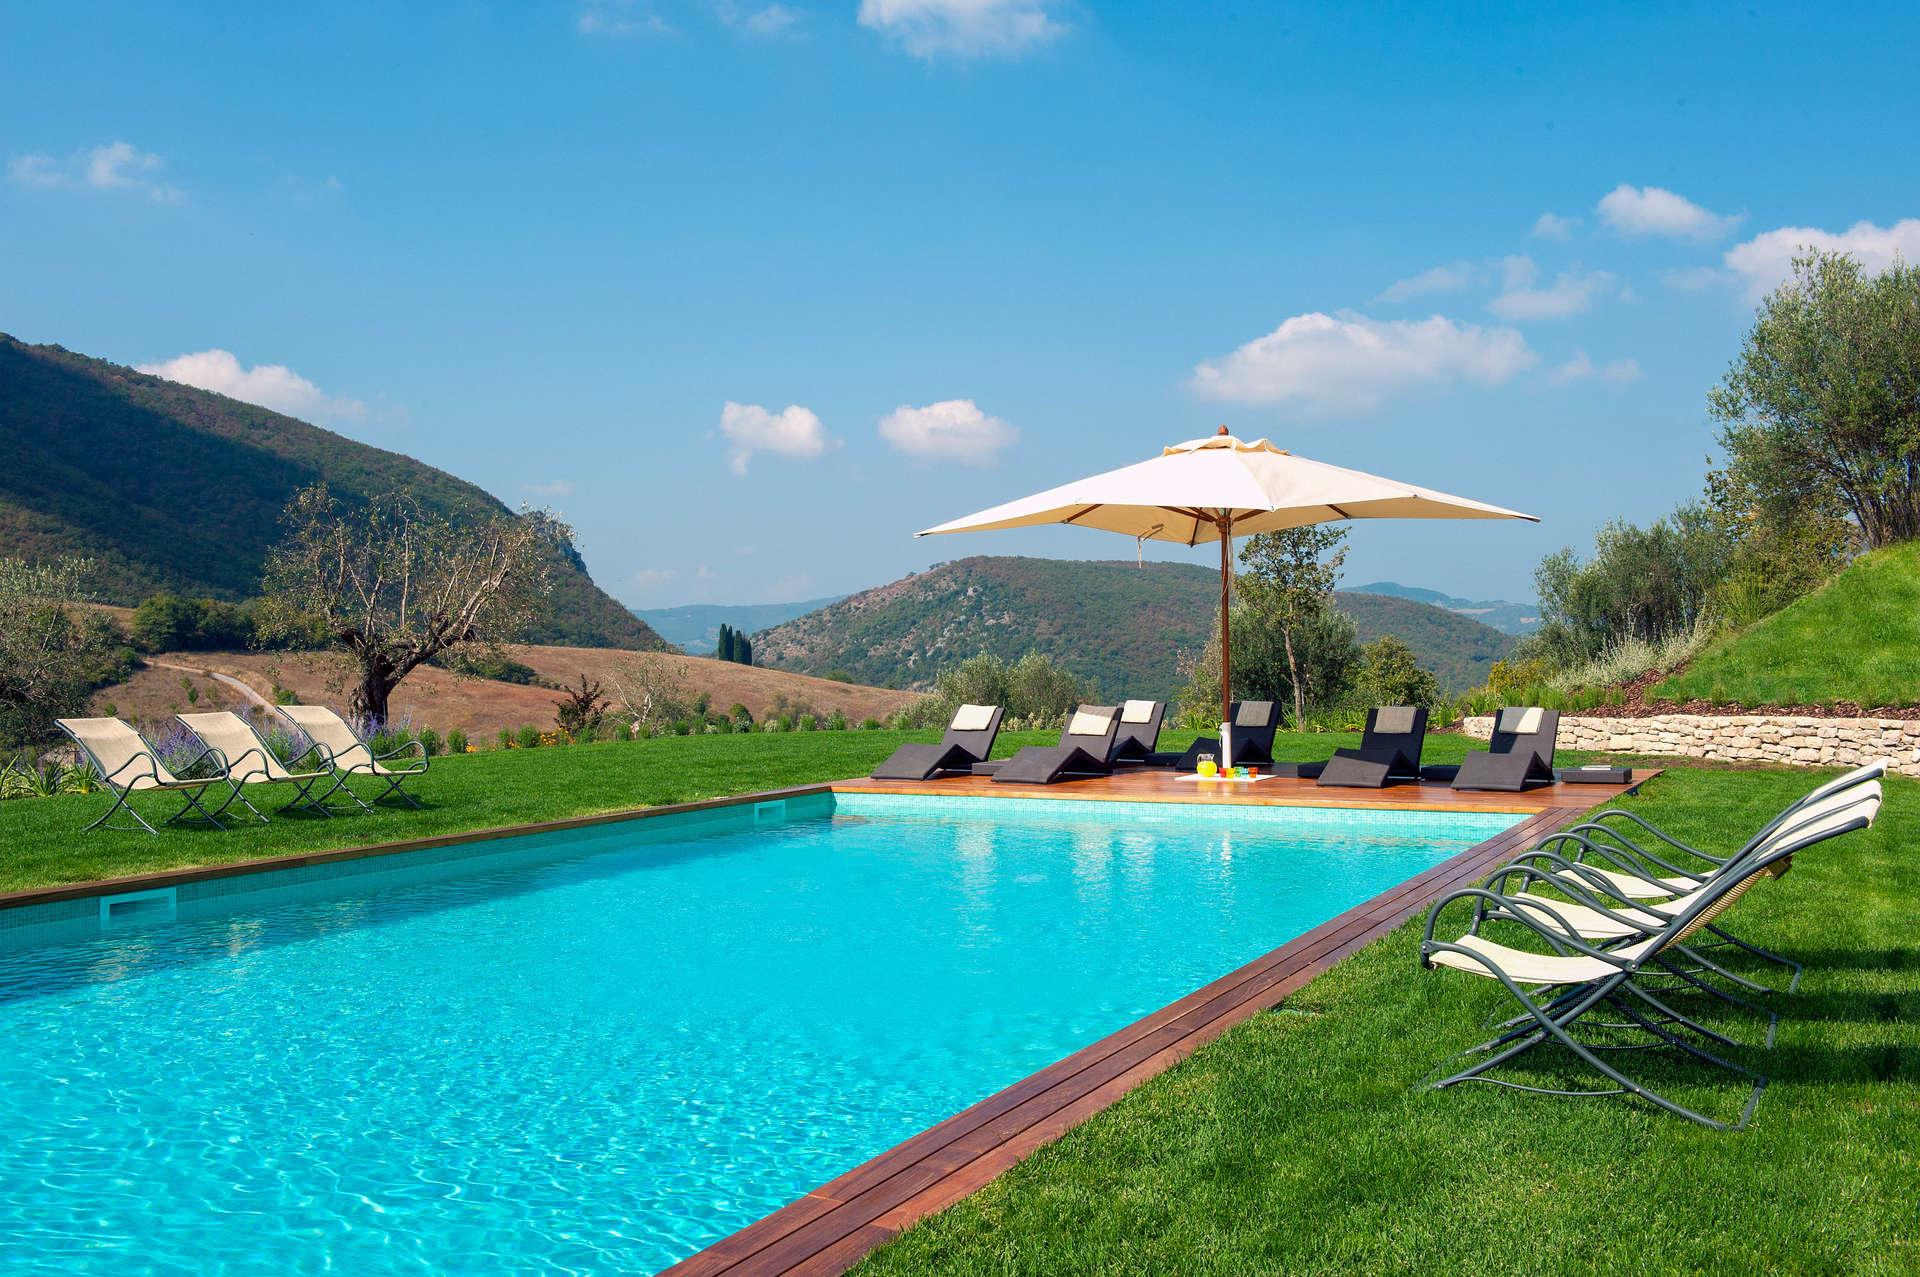 Luxury vacation rentals europe - Italy - Umbria - Umbertide - Dulfa - Image 1/15